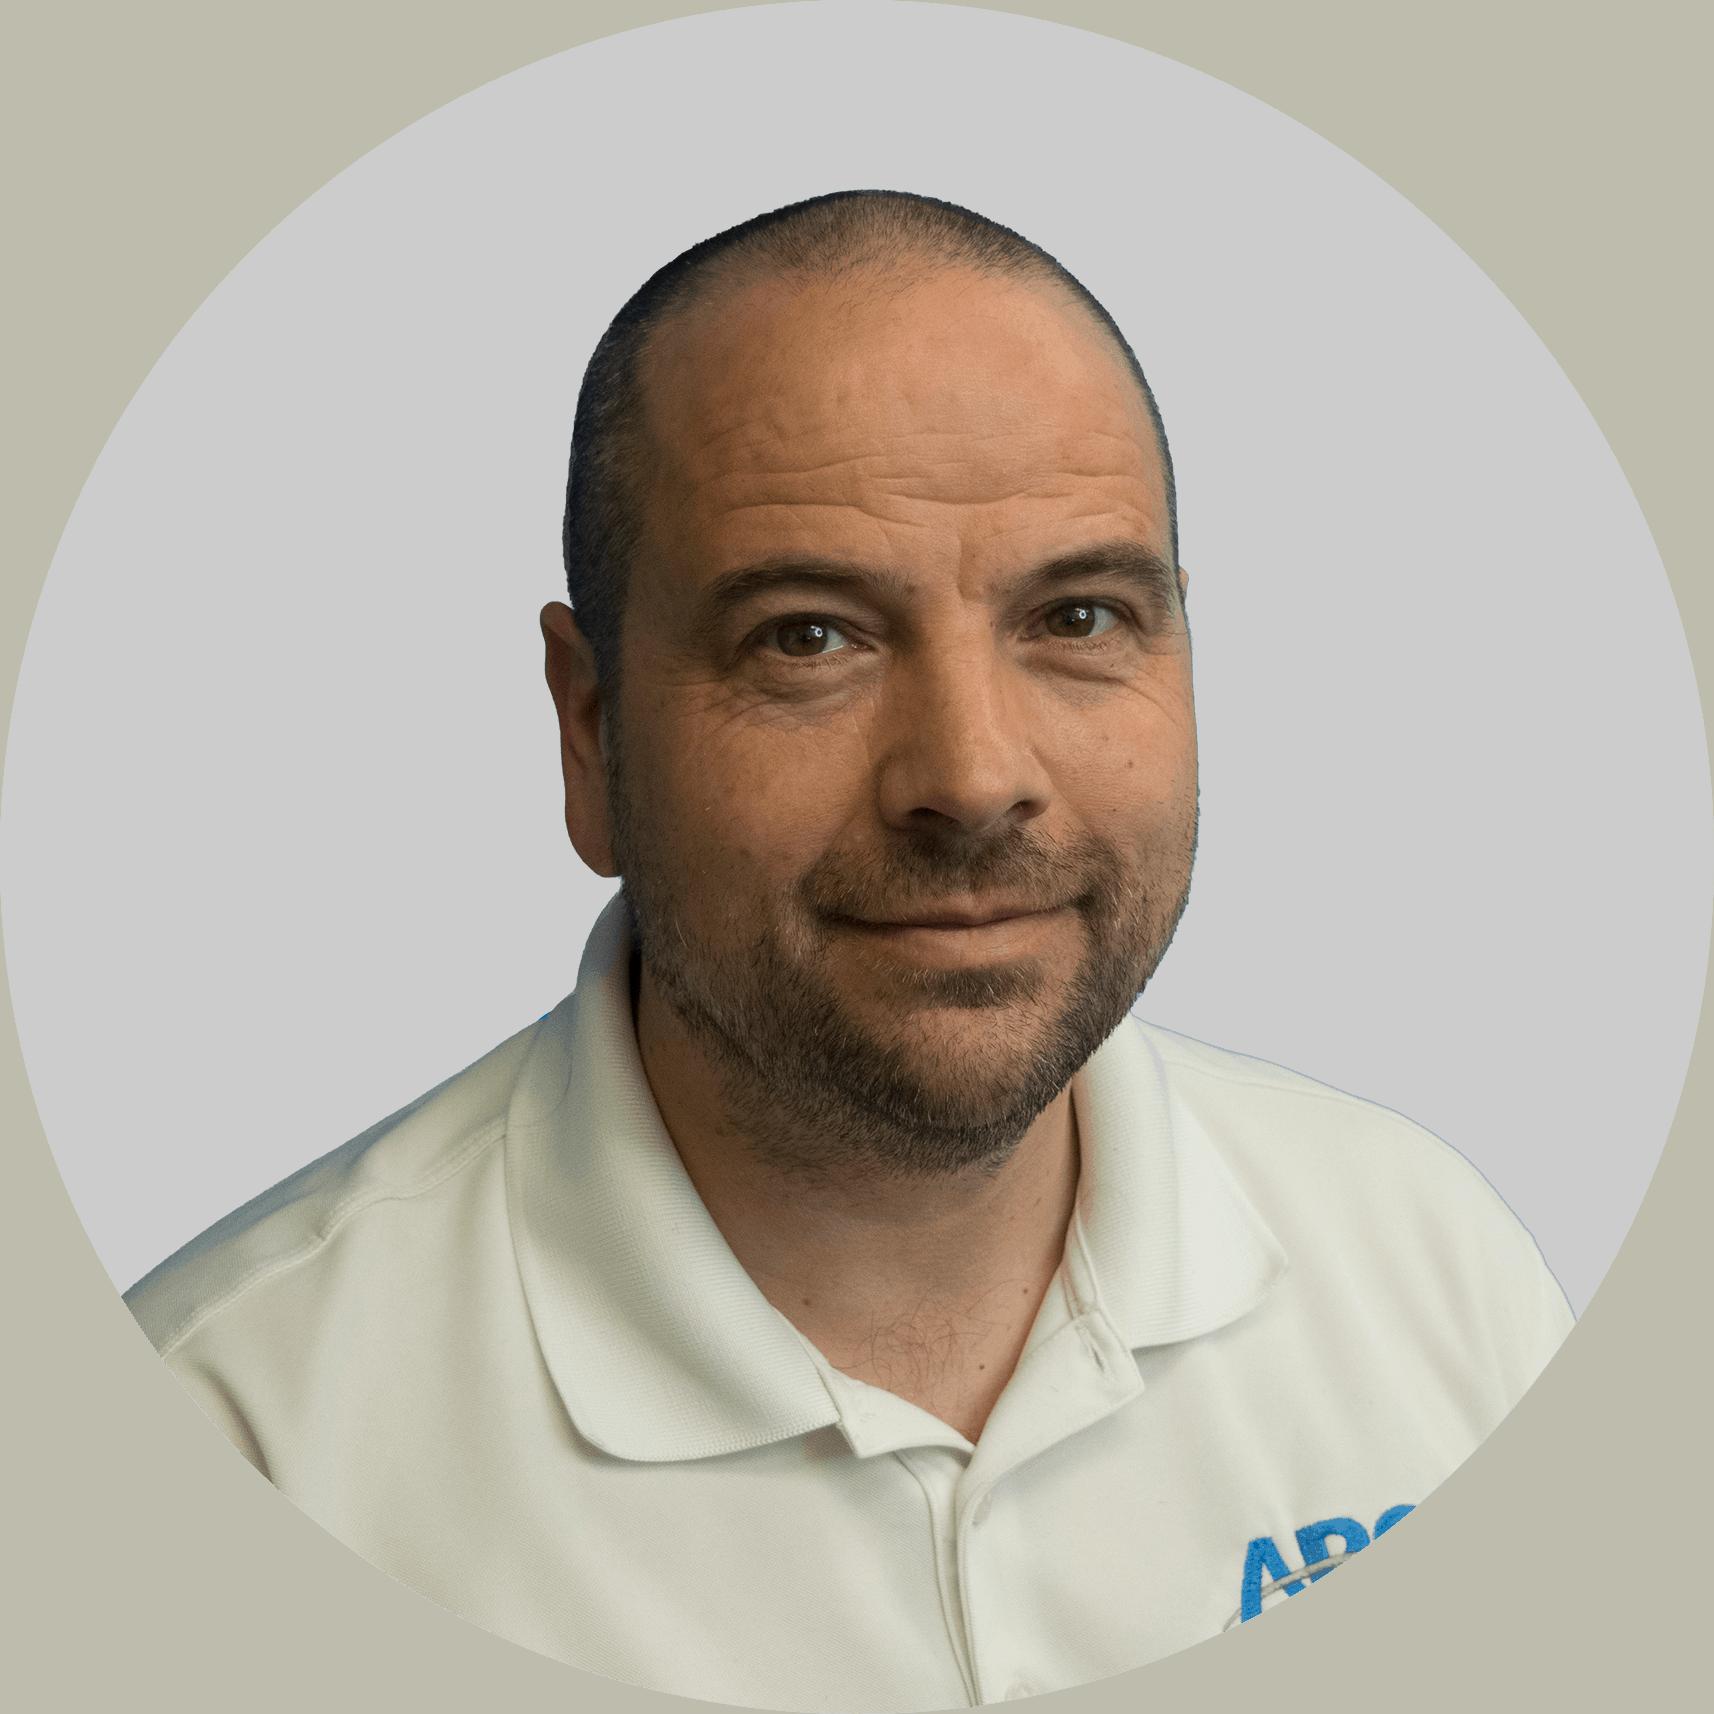 Michael Armitage employee spotlight